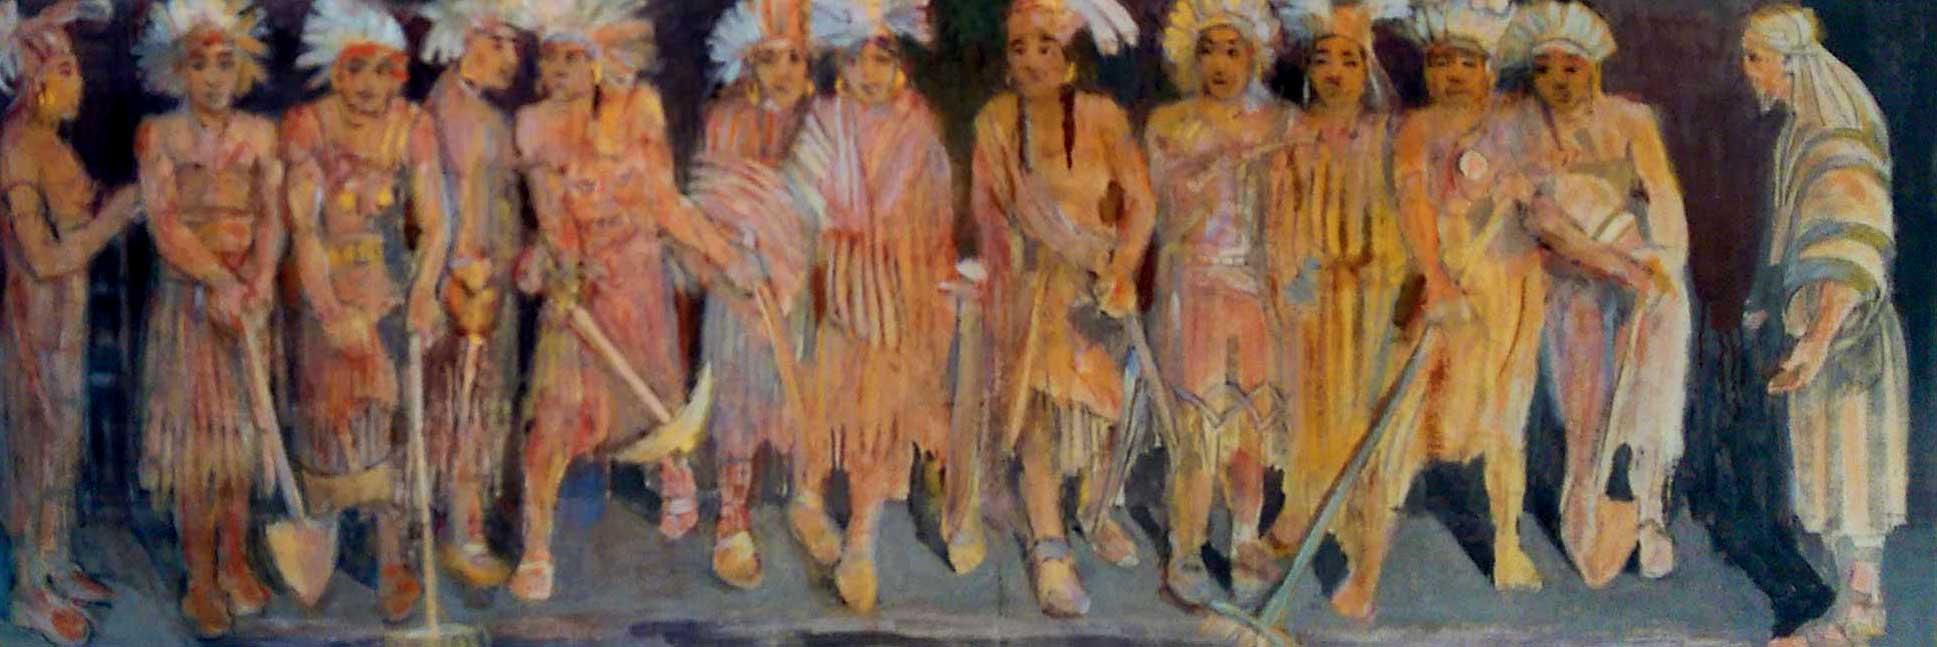 Minerva Teichert Paintings LDS art BYU50.jpg